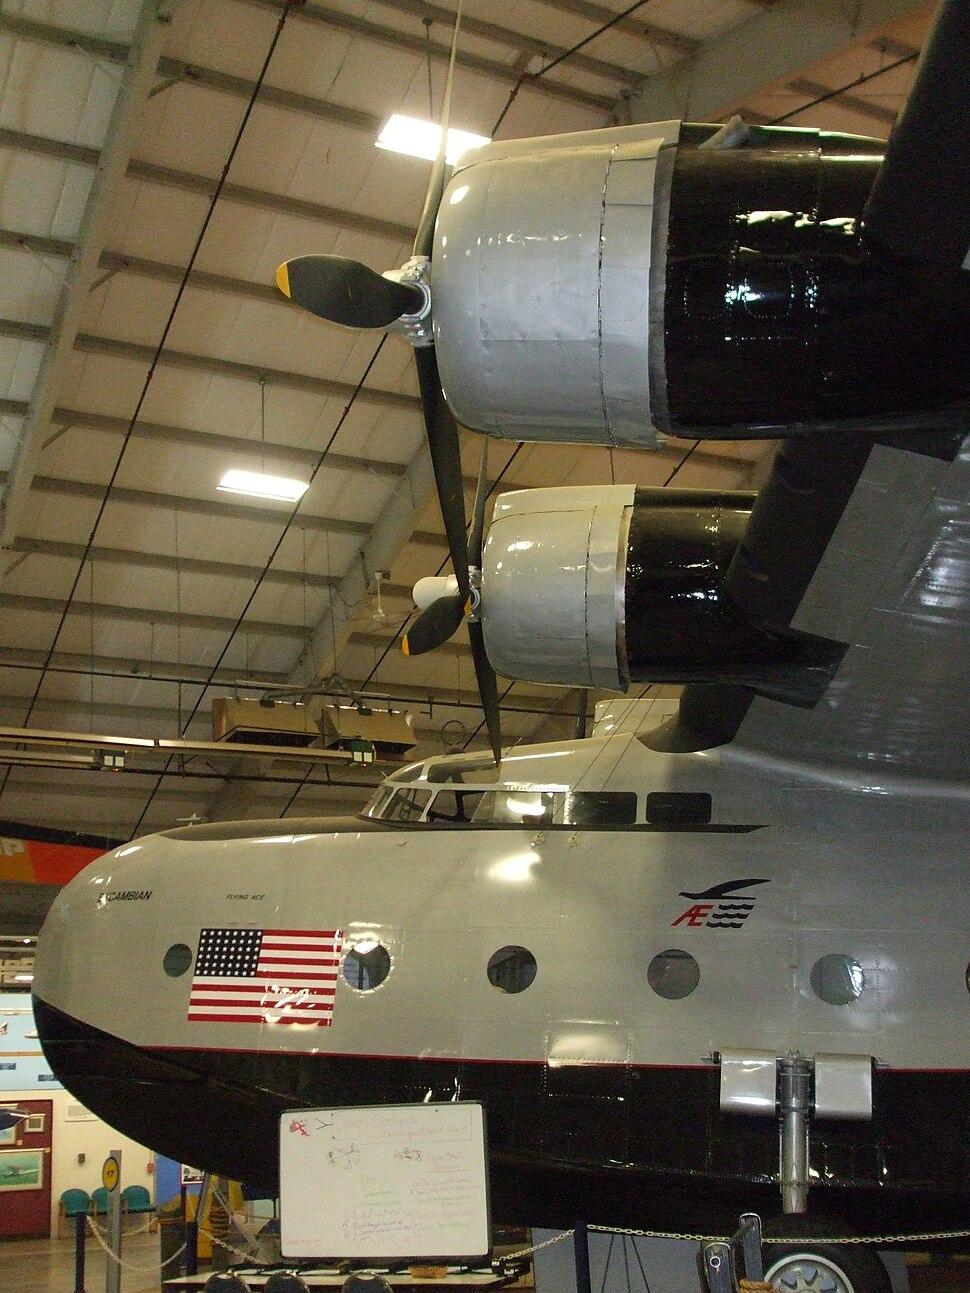 VS-44